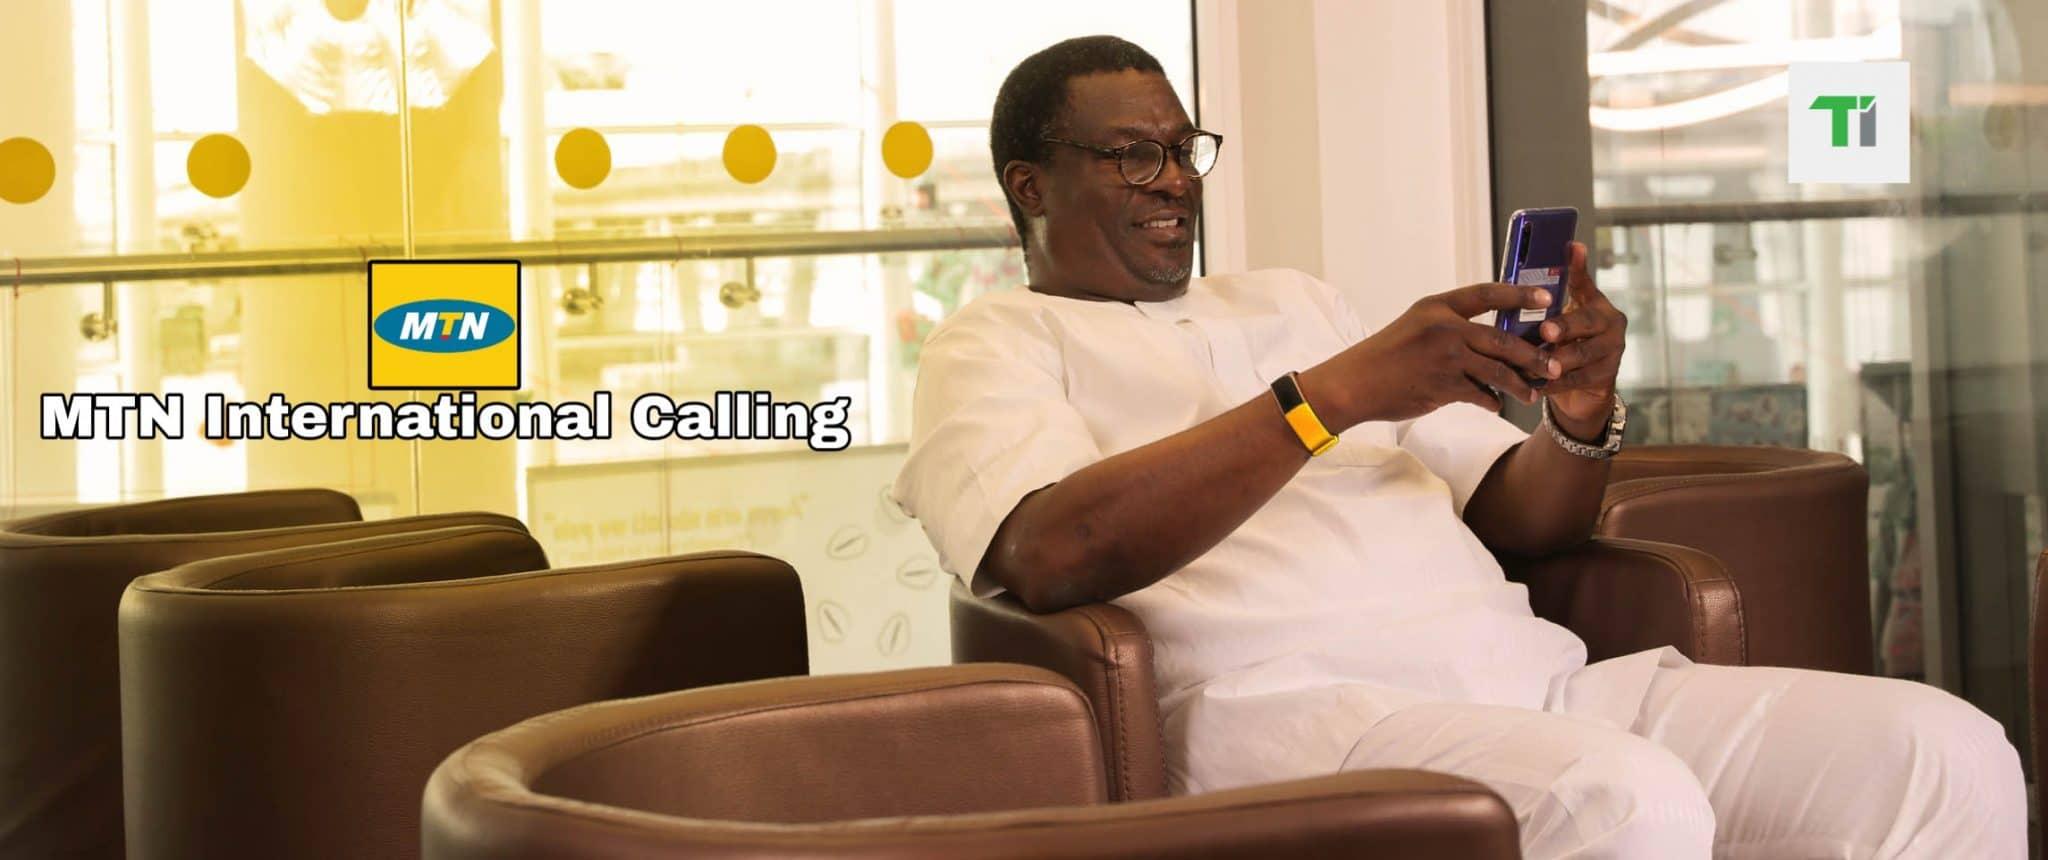 MTN international calling